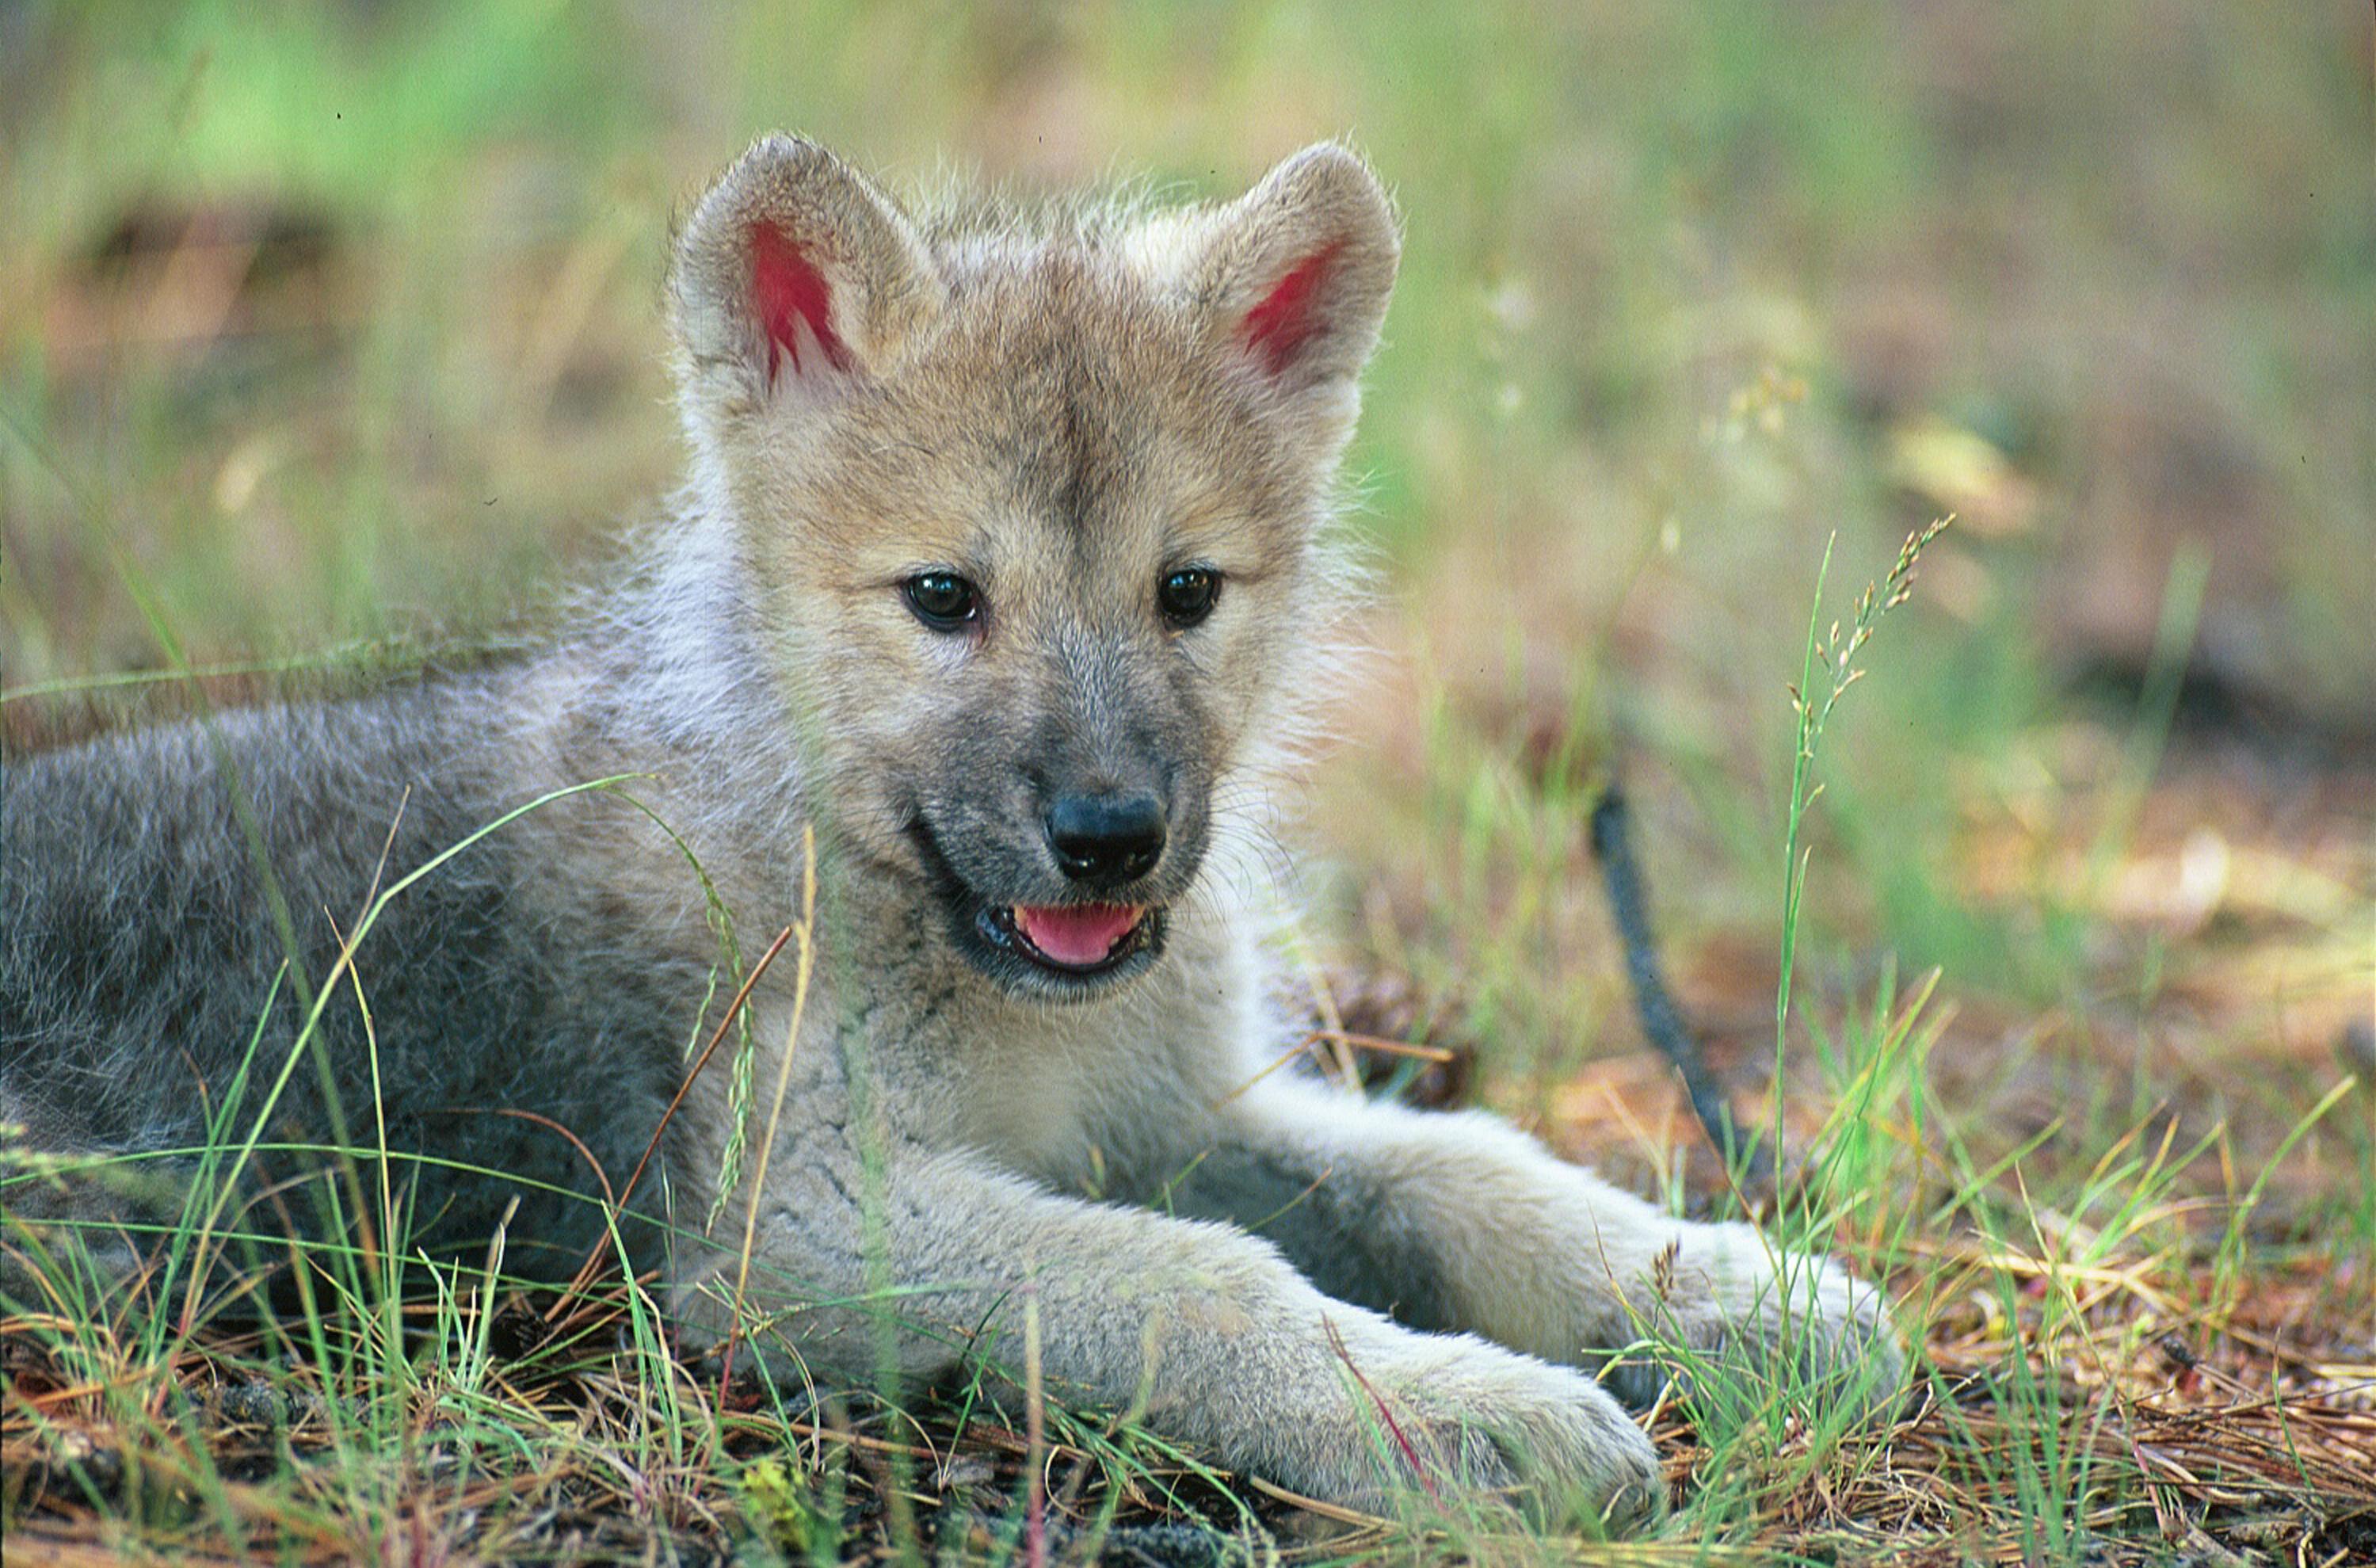 Baby Wolf Wallpaper - WallpaperSafari